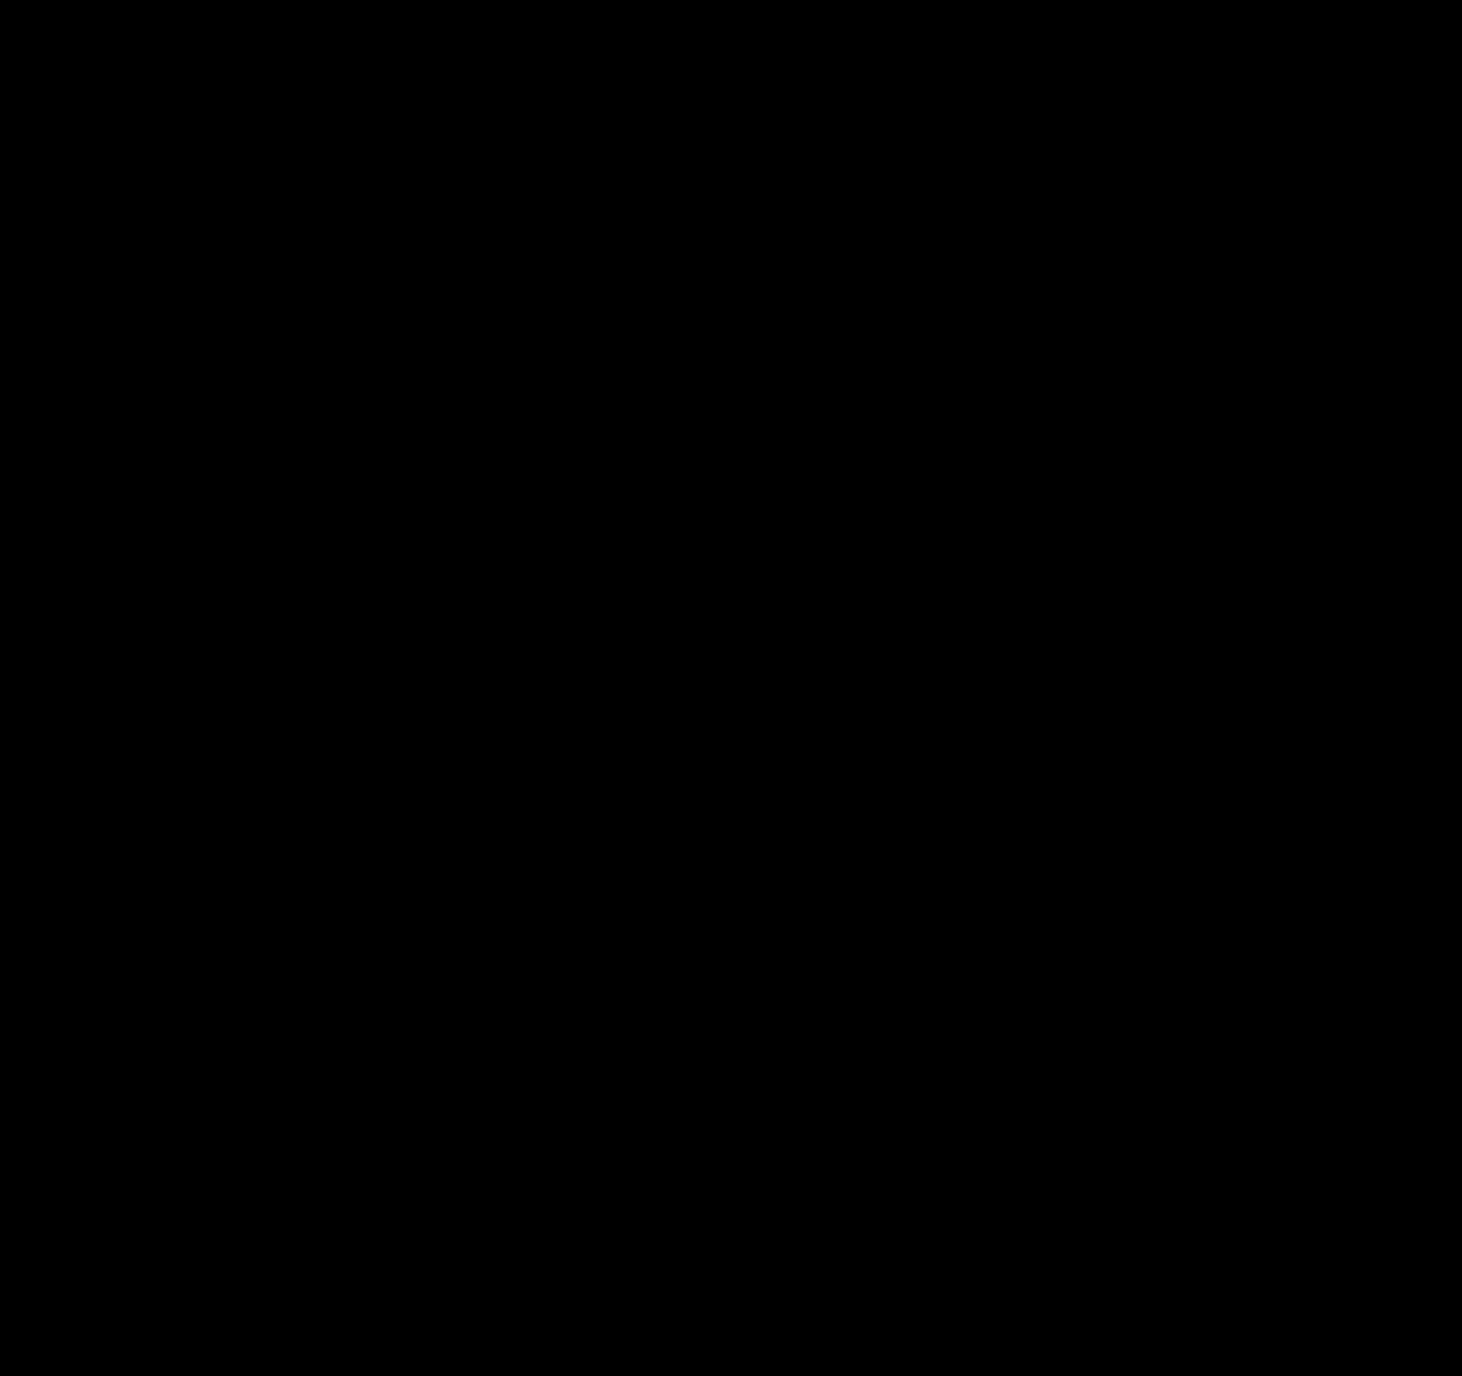 Snapchat Clipart Black Snapchat Logo Png 1600x1600 Png Clipart Download Snapchat Logo Black And White Aesthetic Butterfly Wall Art